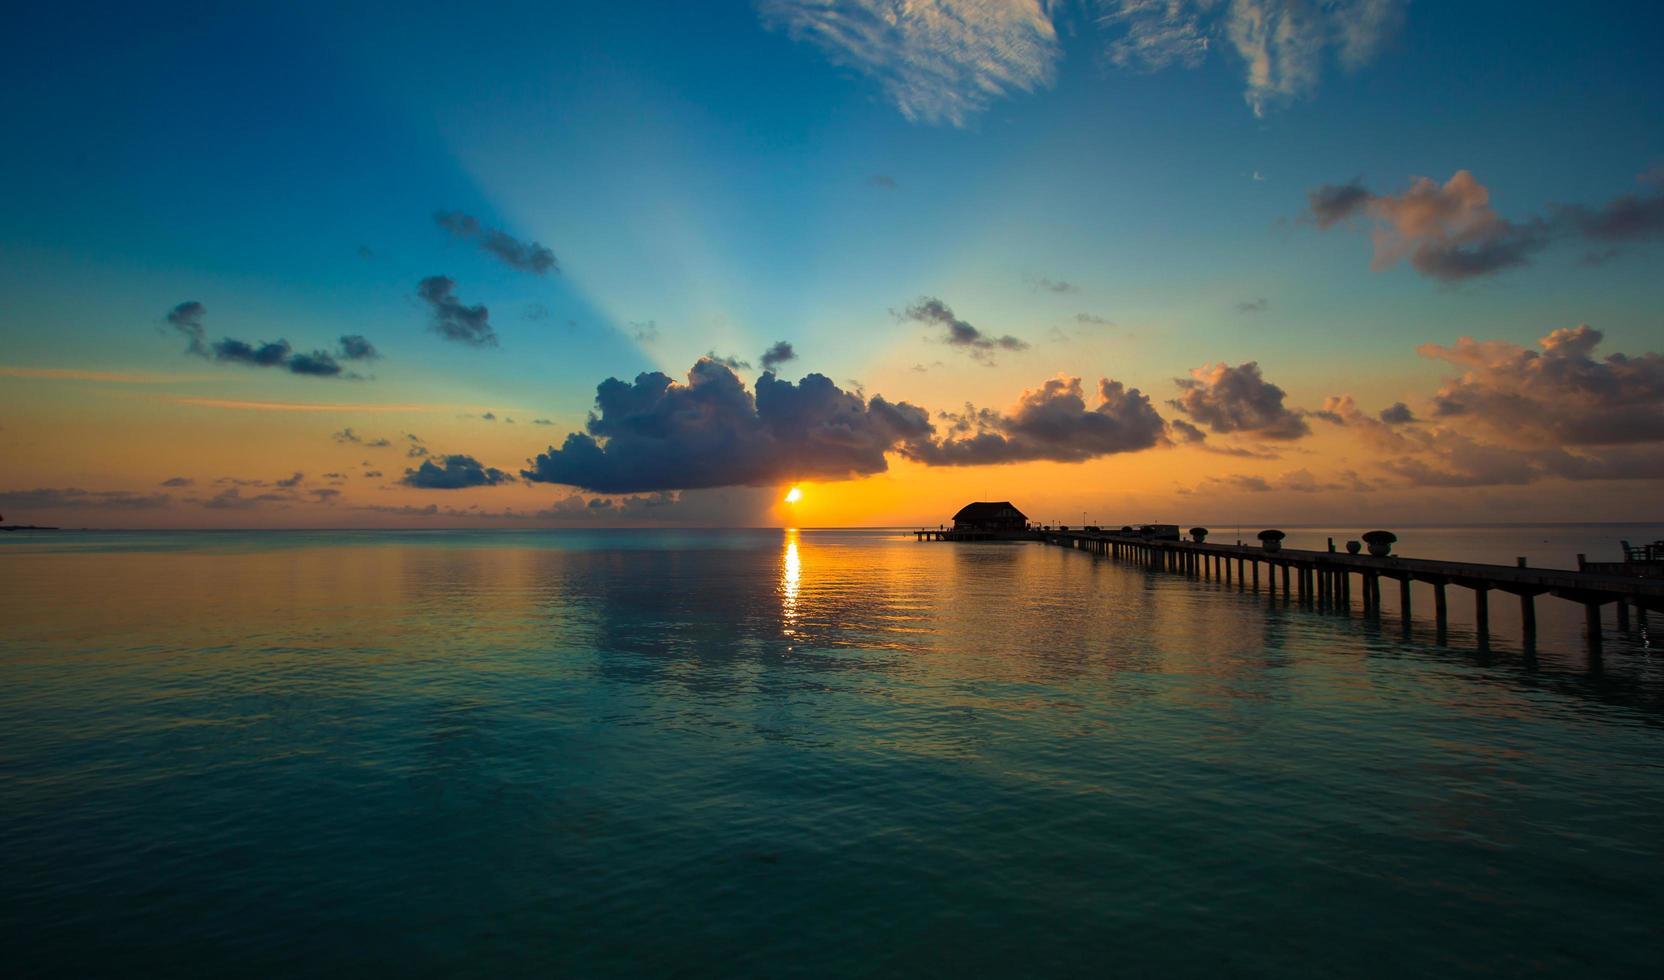 Maldiven, Zuid-Azië, 2020 - kleurrijke zonsondergang op een tropisch eiland foto